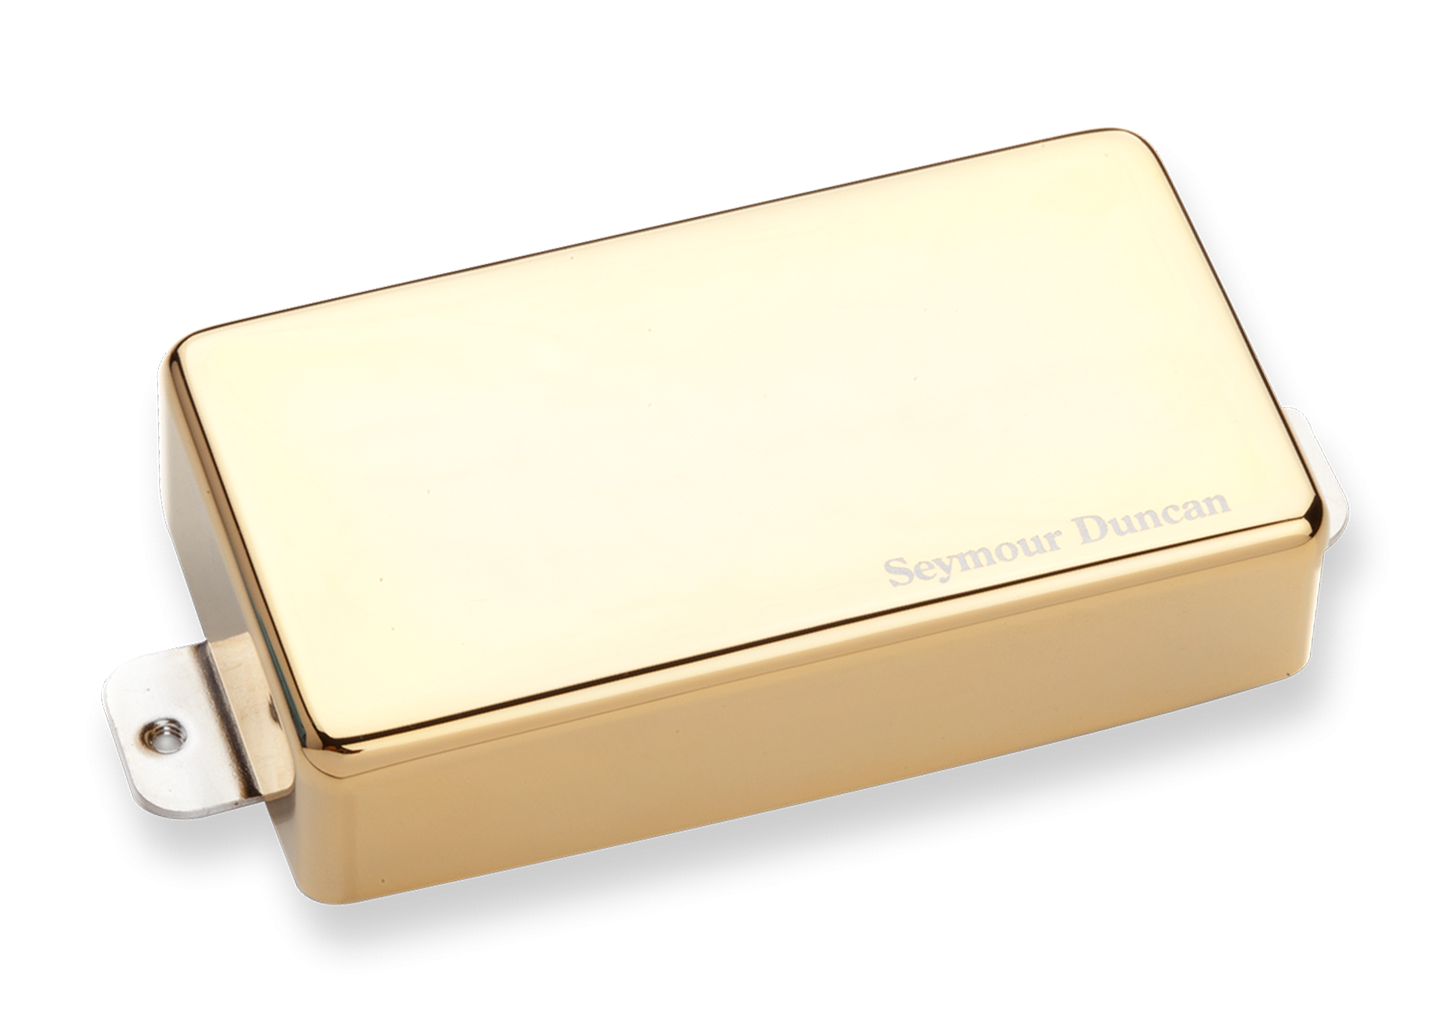 Seymour Duncan Blackouts AHB-1N Neck Gold